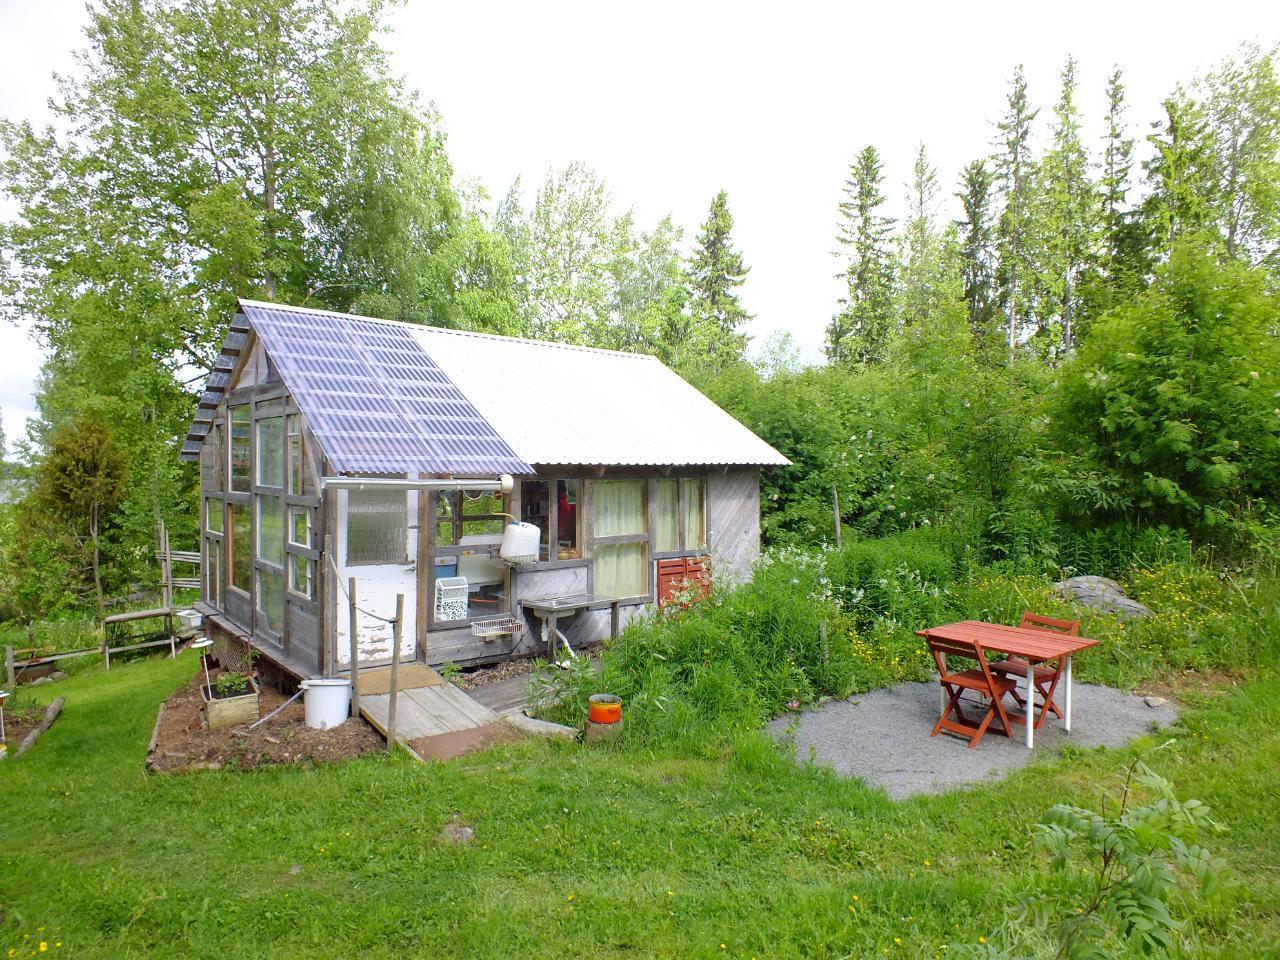 Ferienhaus - Mökki mit Sauna direkt am See  in Mouhijärvi-Sastamala (1707905), Mouhijärvi, , Westfinnland, Finnland, Bild 6